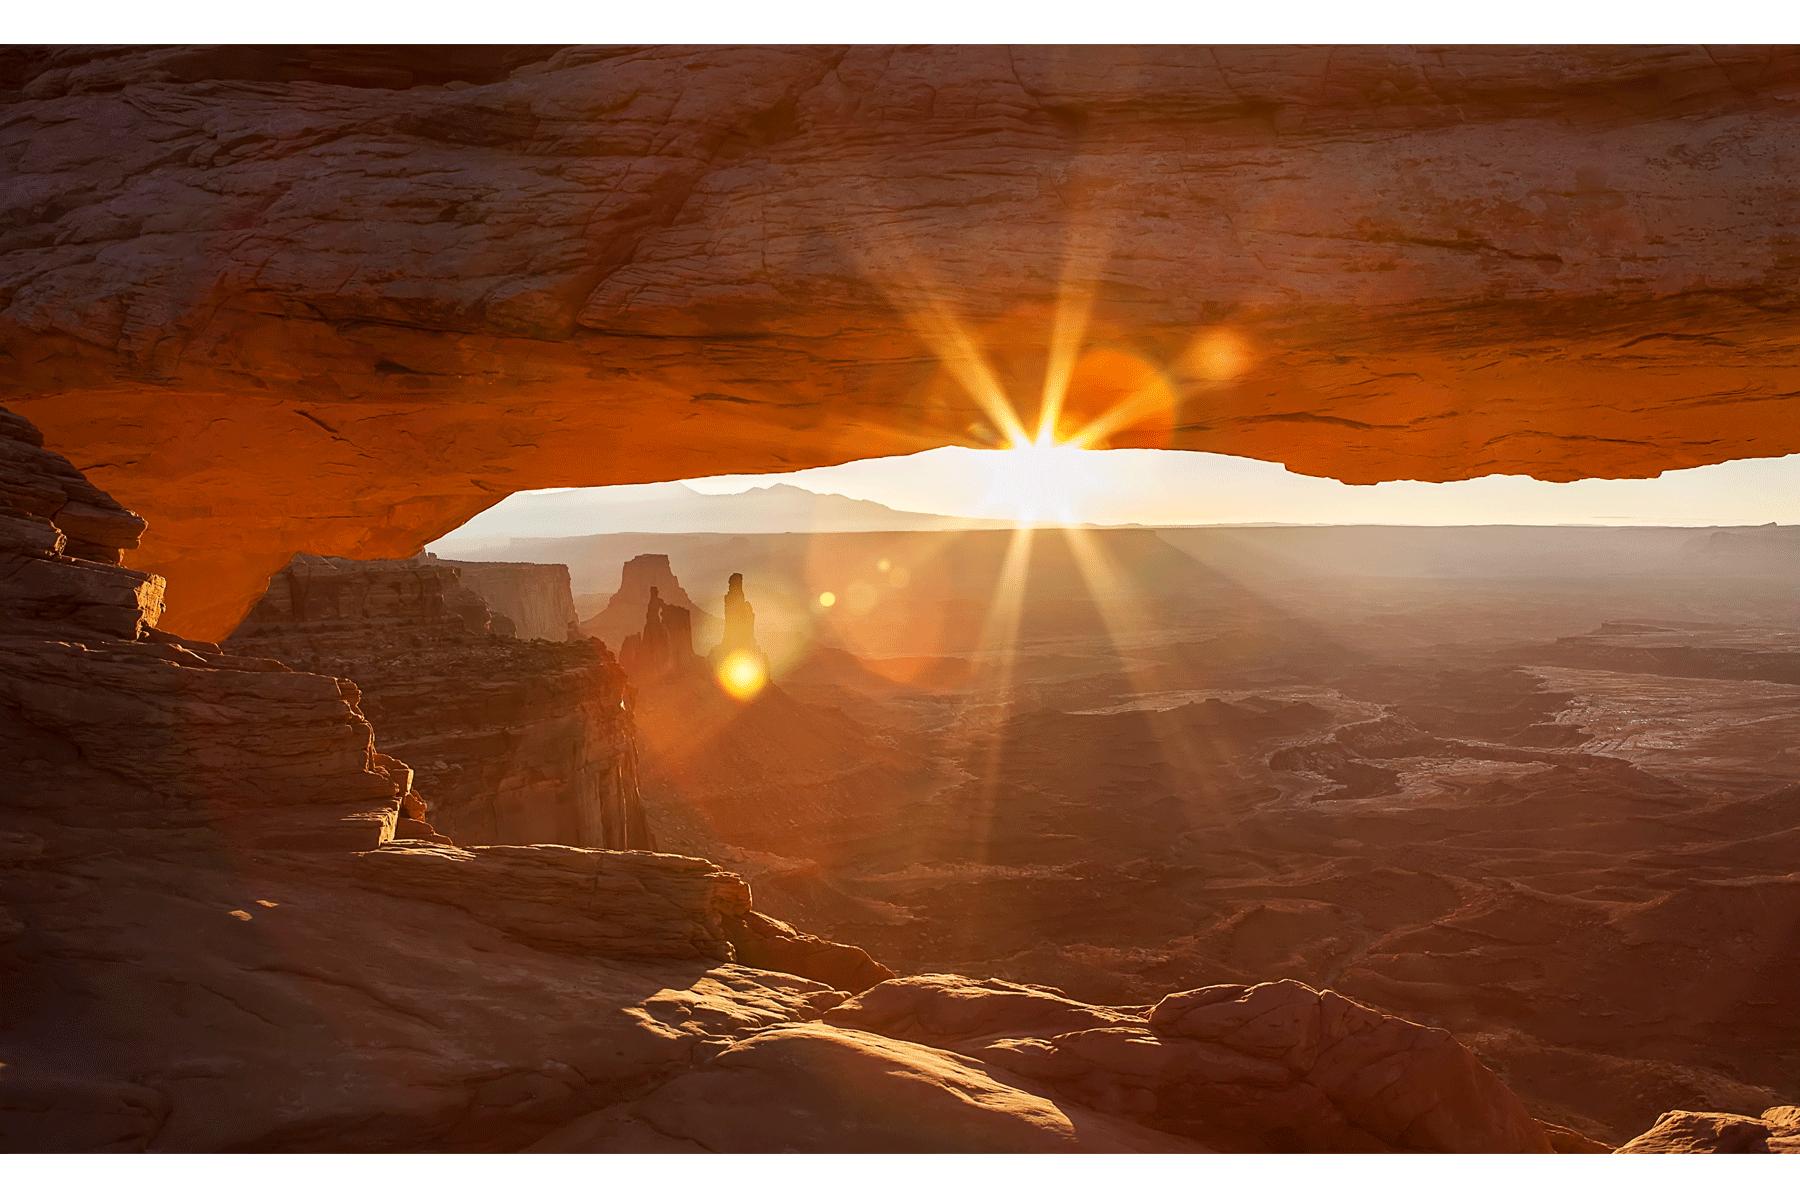 mesa-arch-canyonlands-national-park-utah